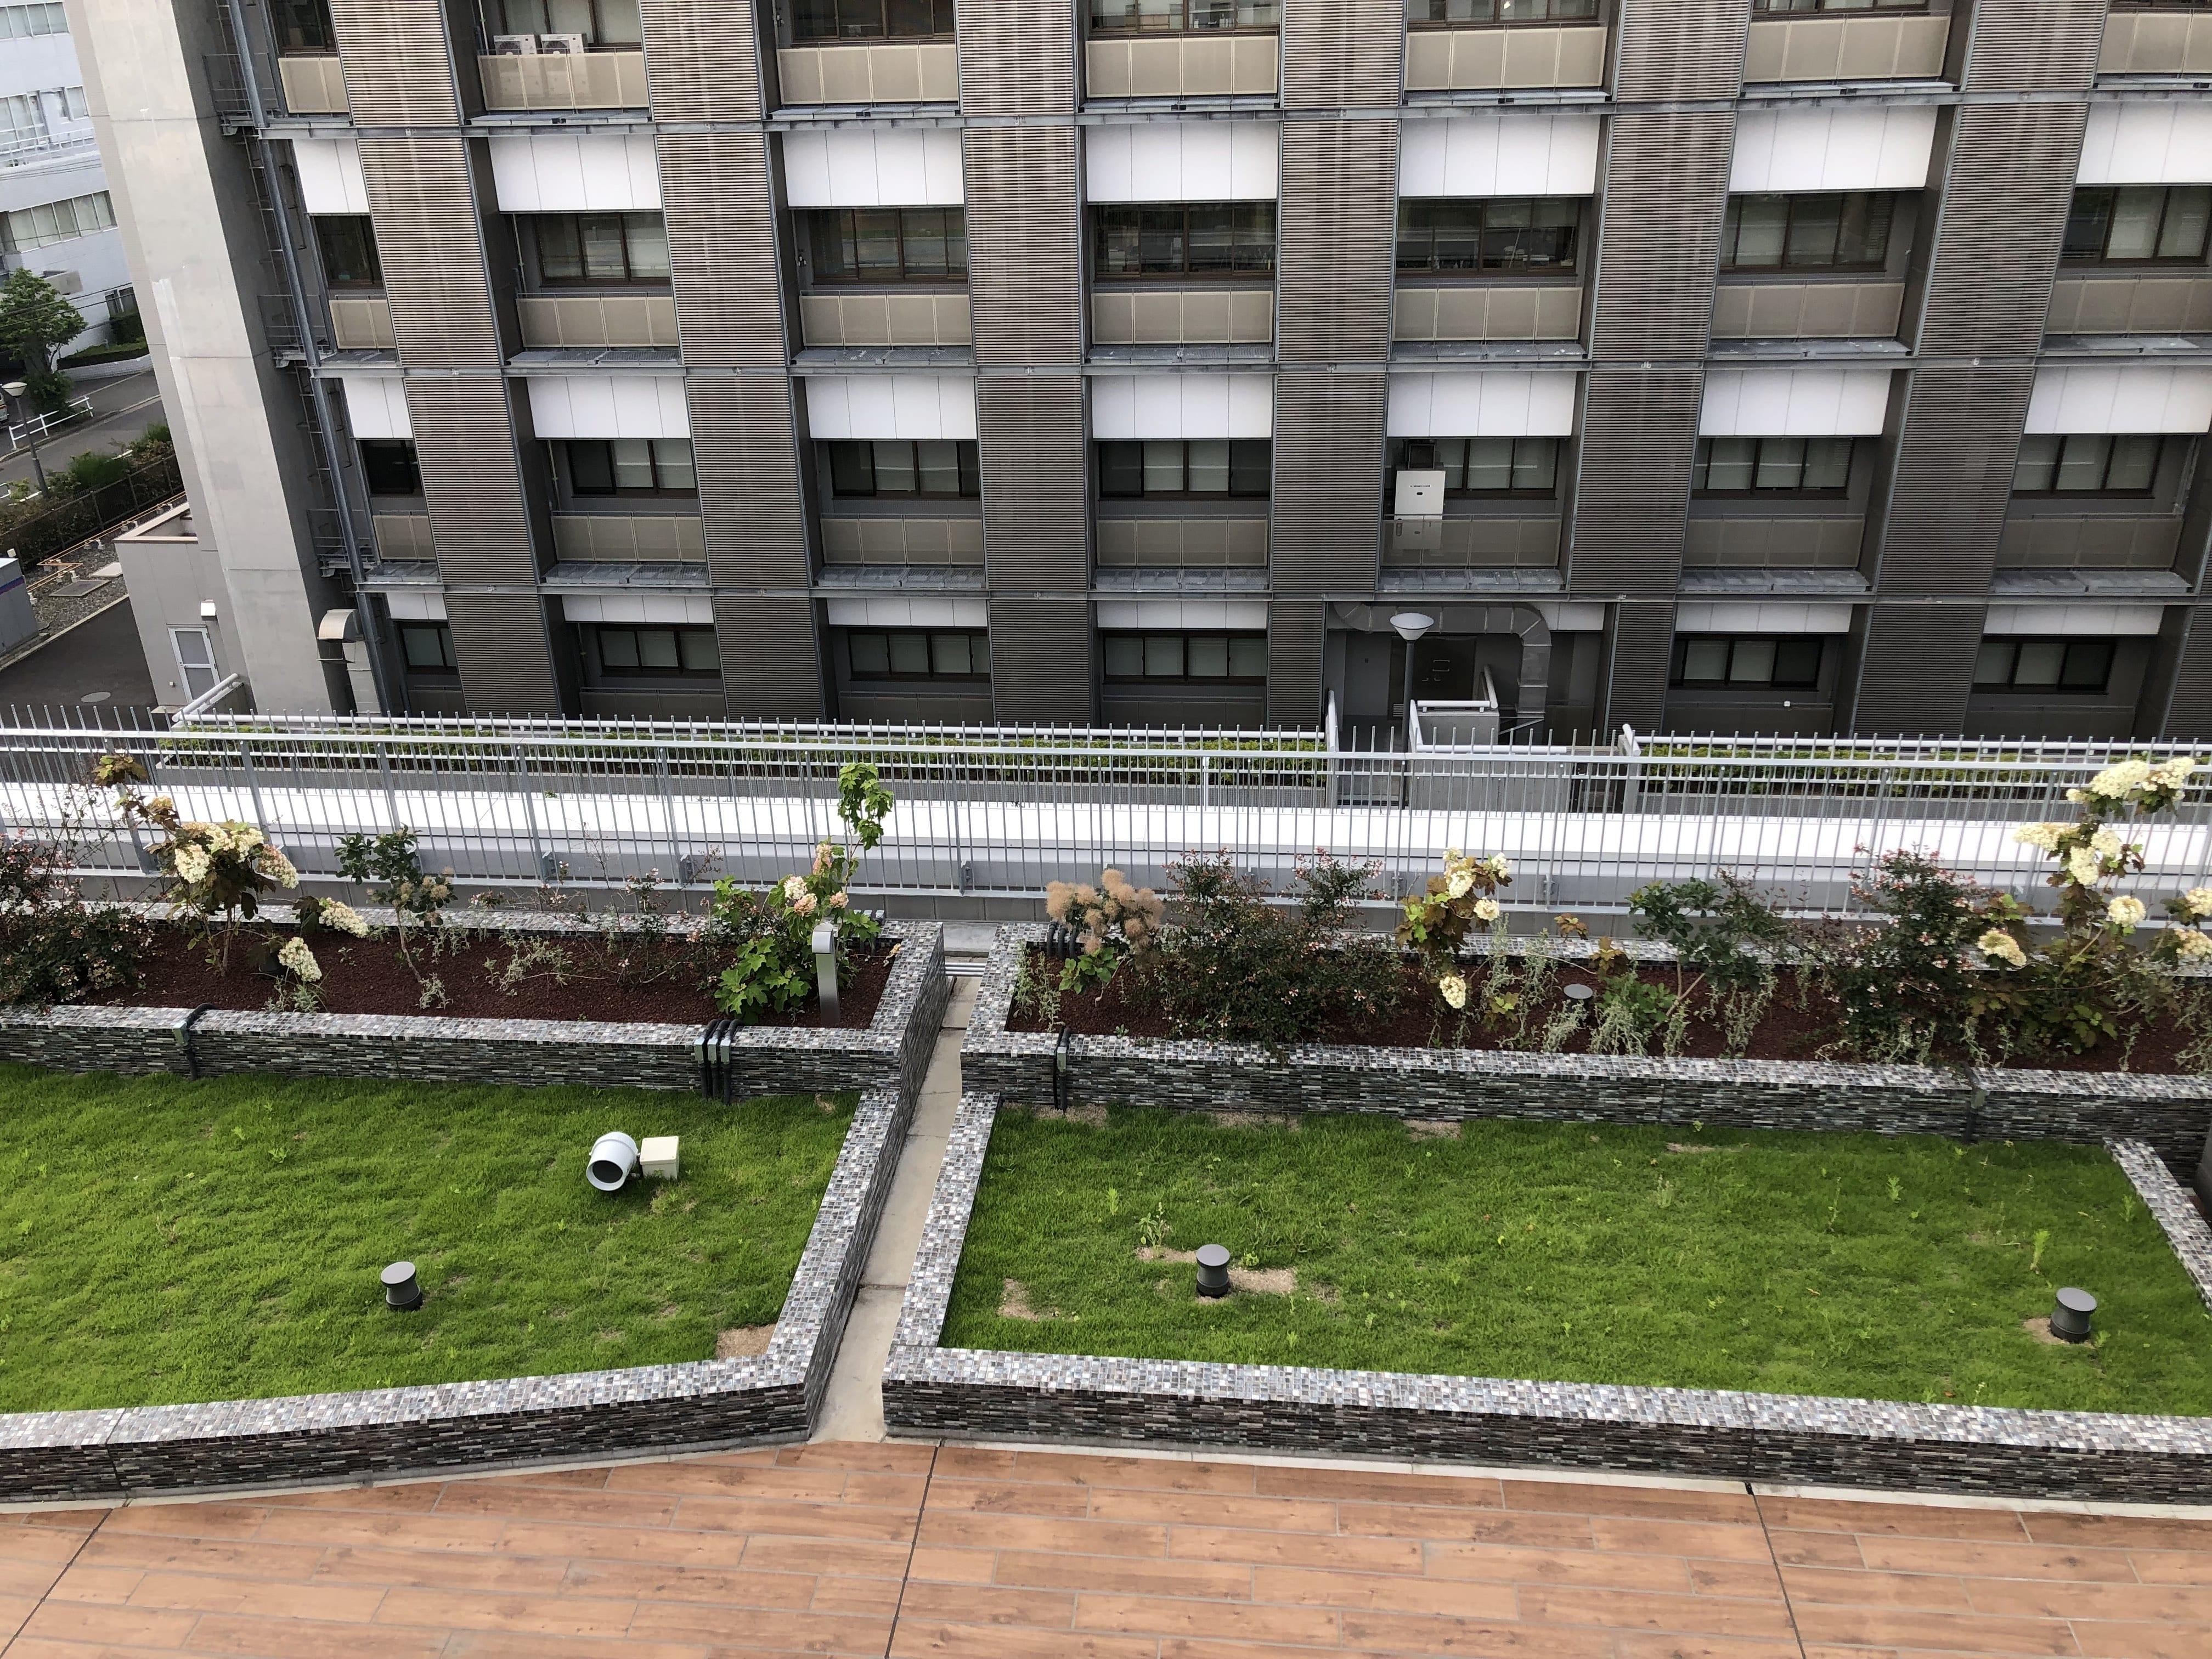 Oberlin University - Shinjuku Campus - photo 3